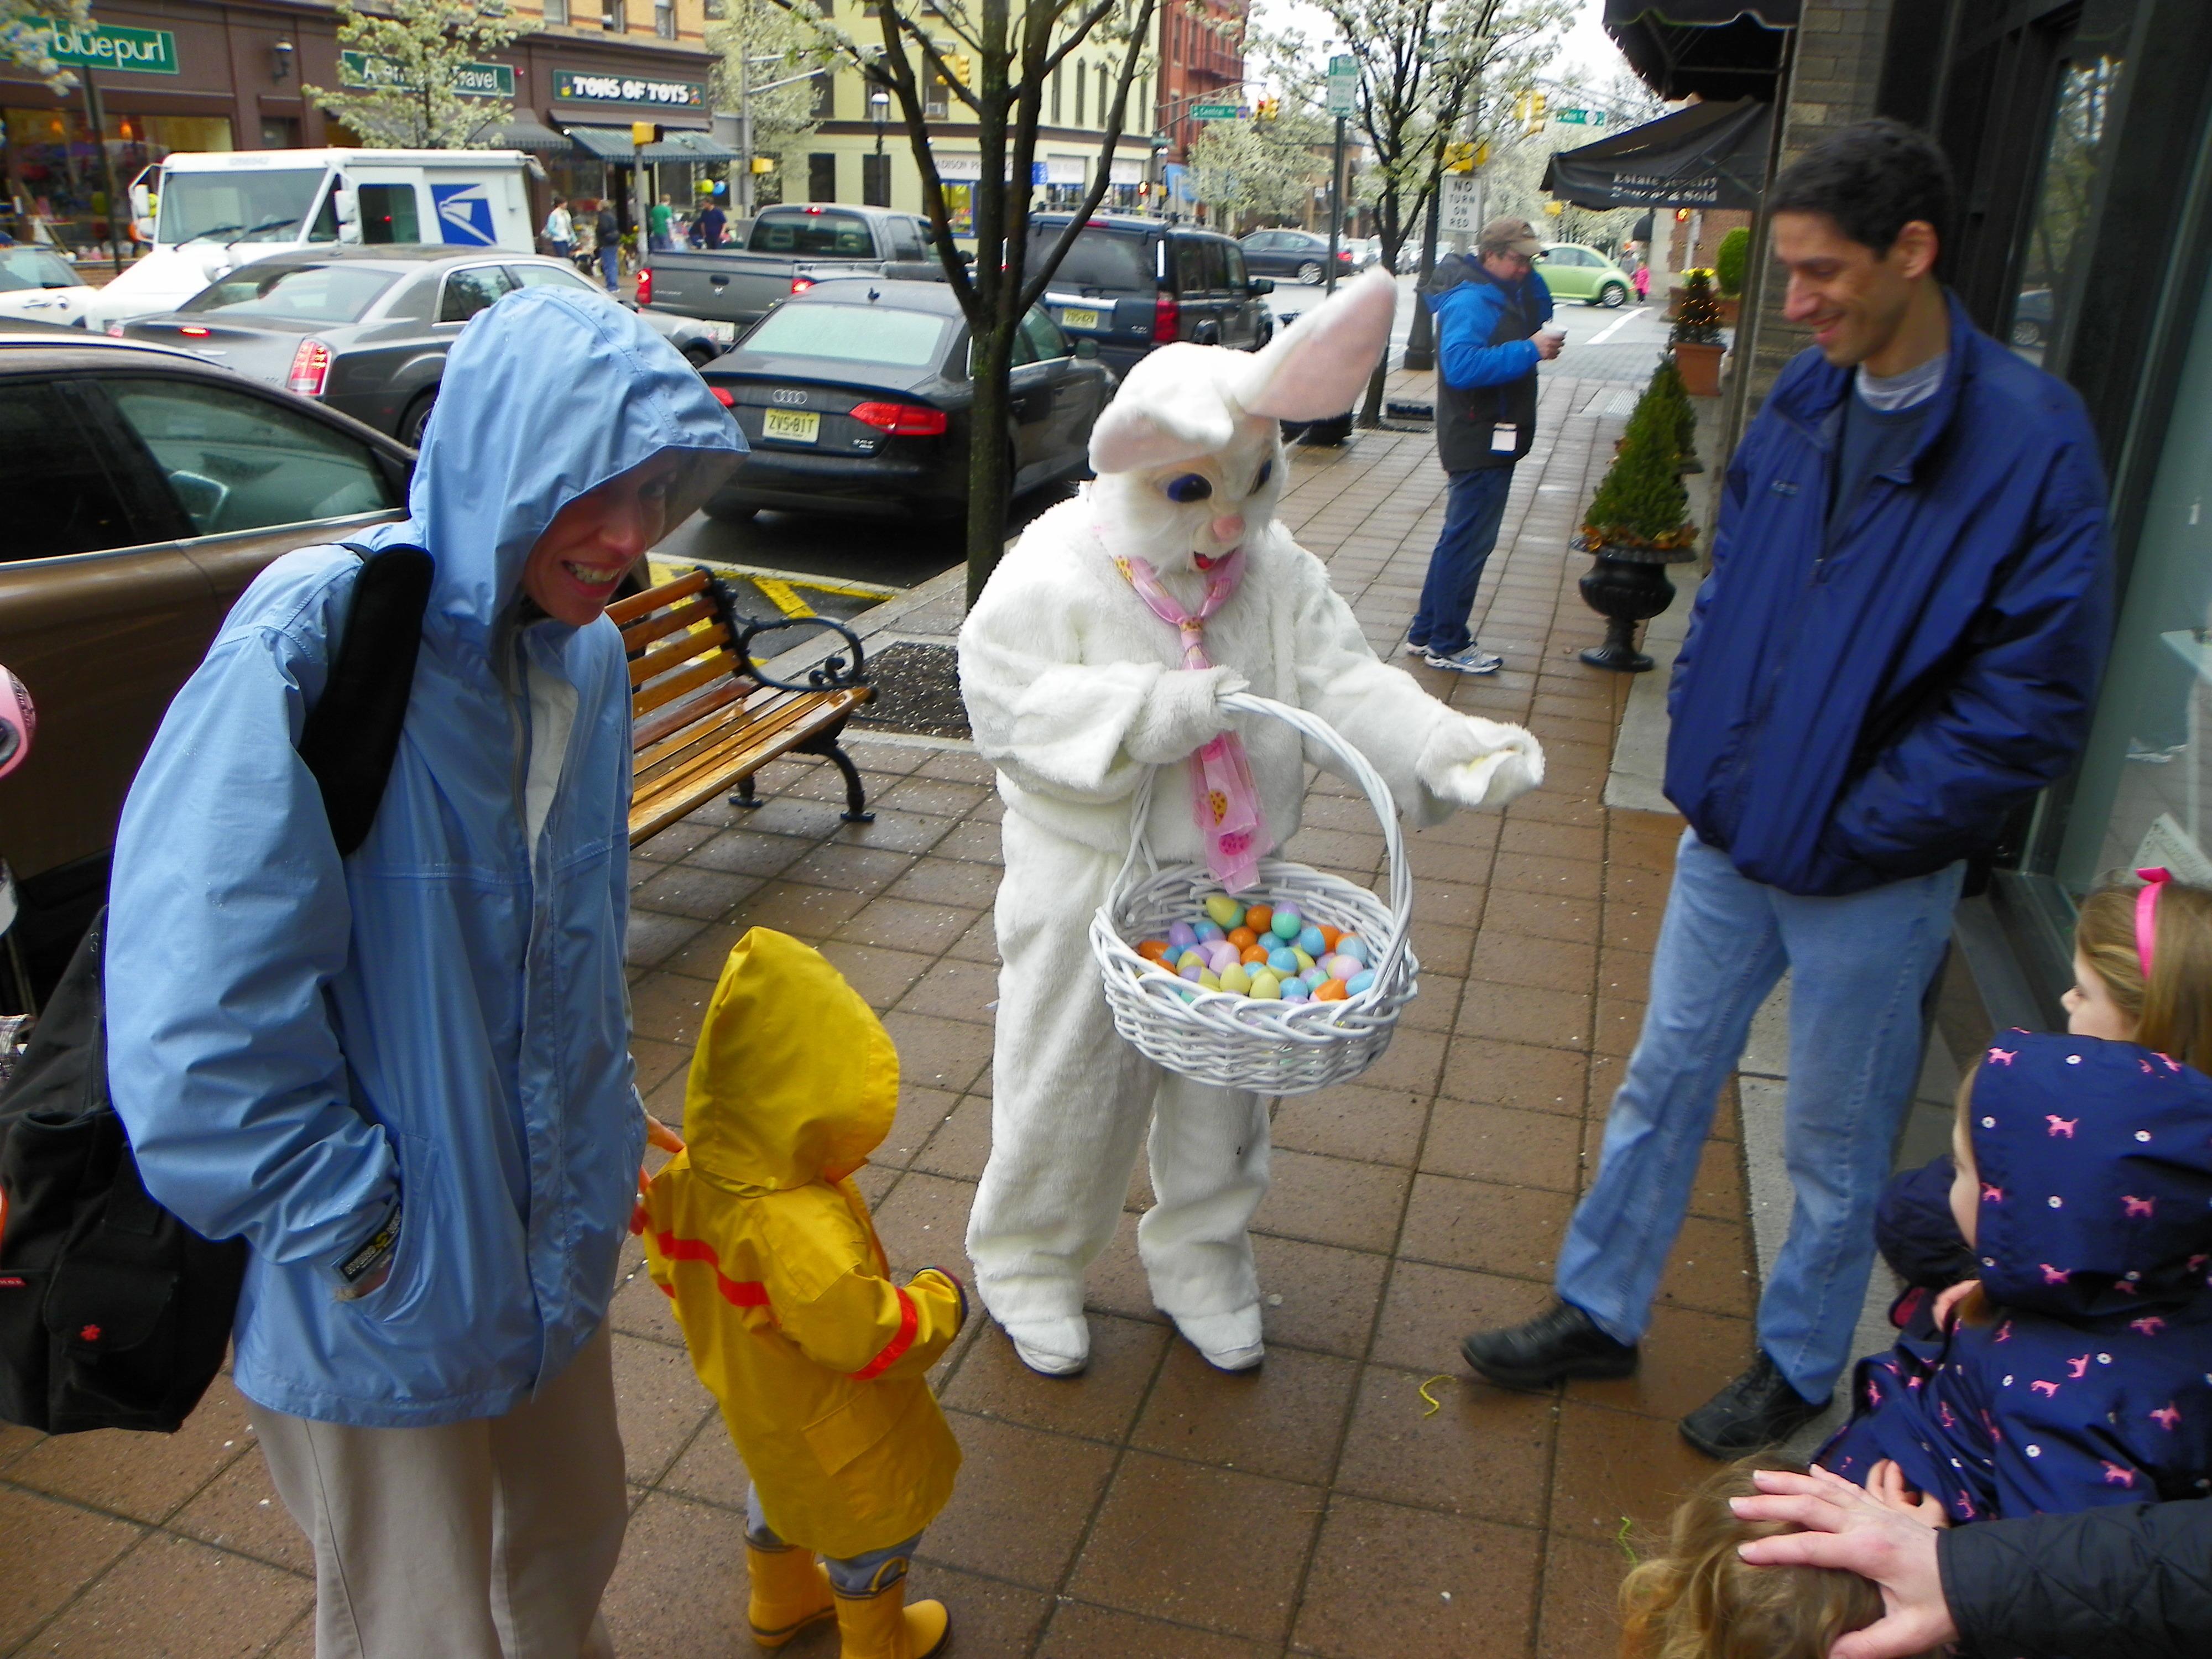 f901f5b6cf598b692f7b_Easter_Fun_Fest_2012_photo_Bunny.jpg